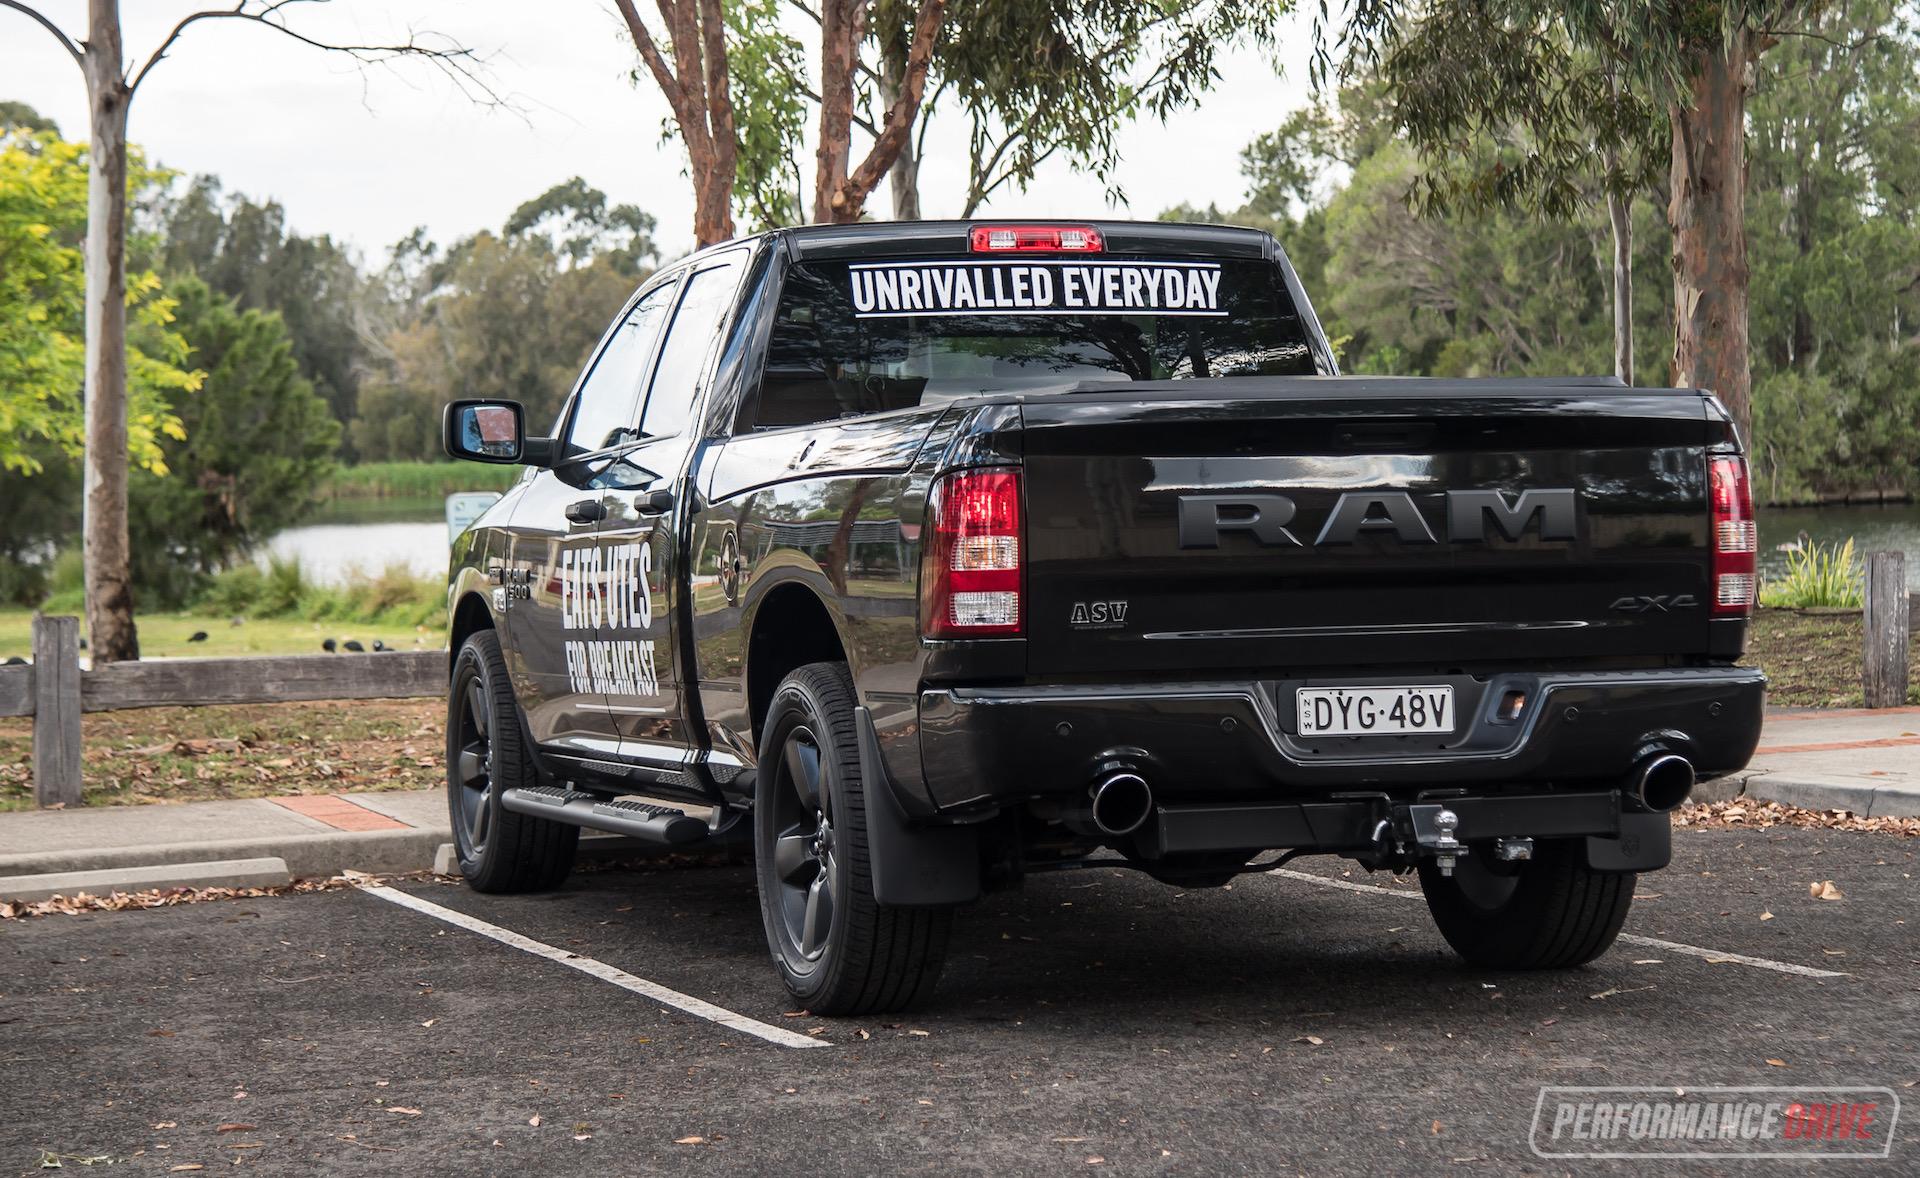 2019 Ram 1500 Express V8 Review Video Performancedrive